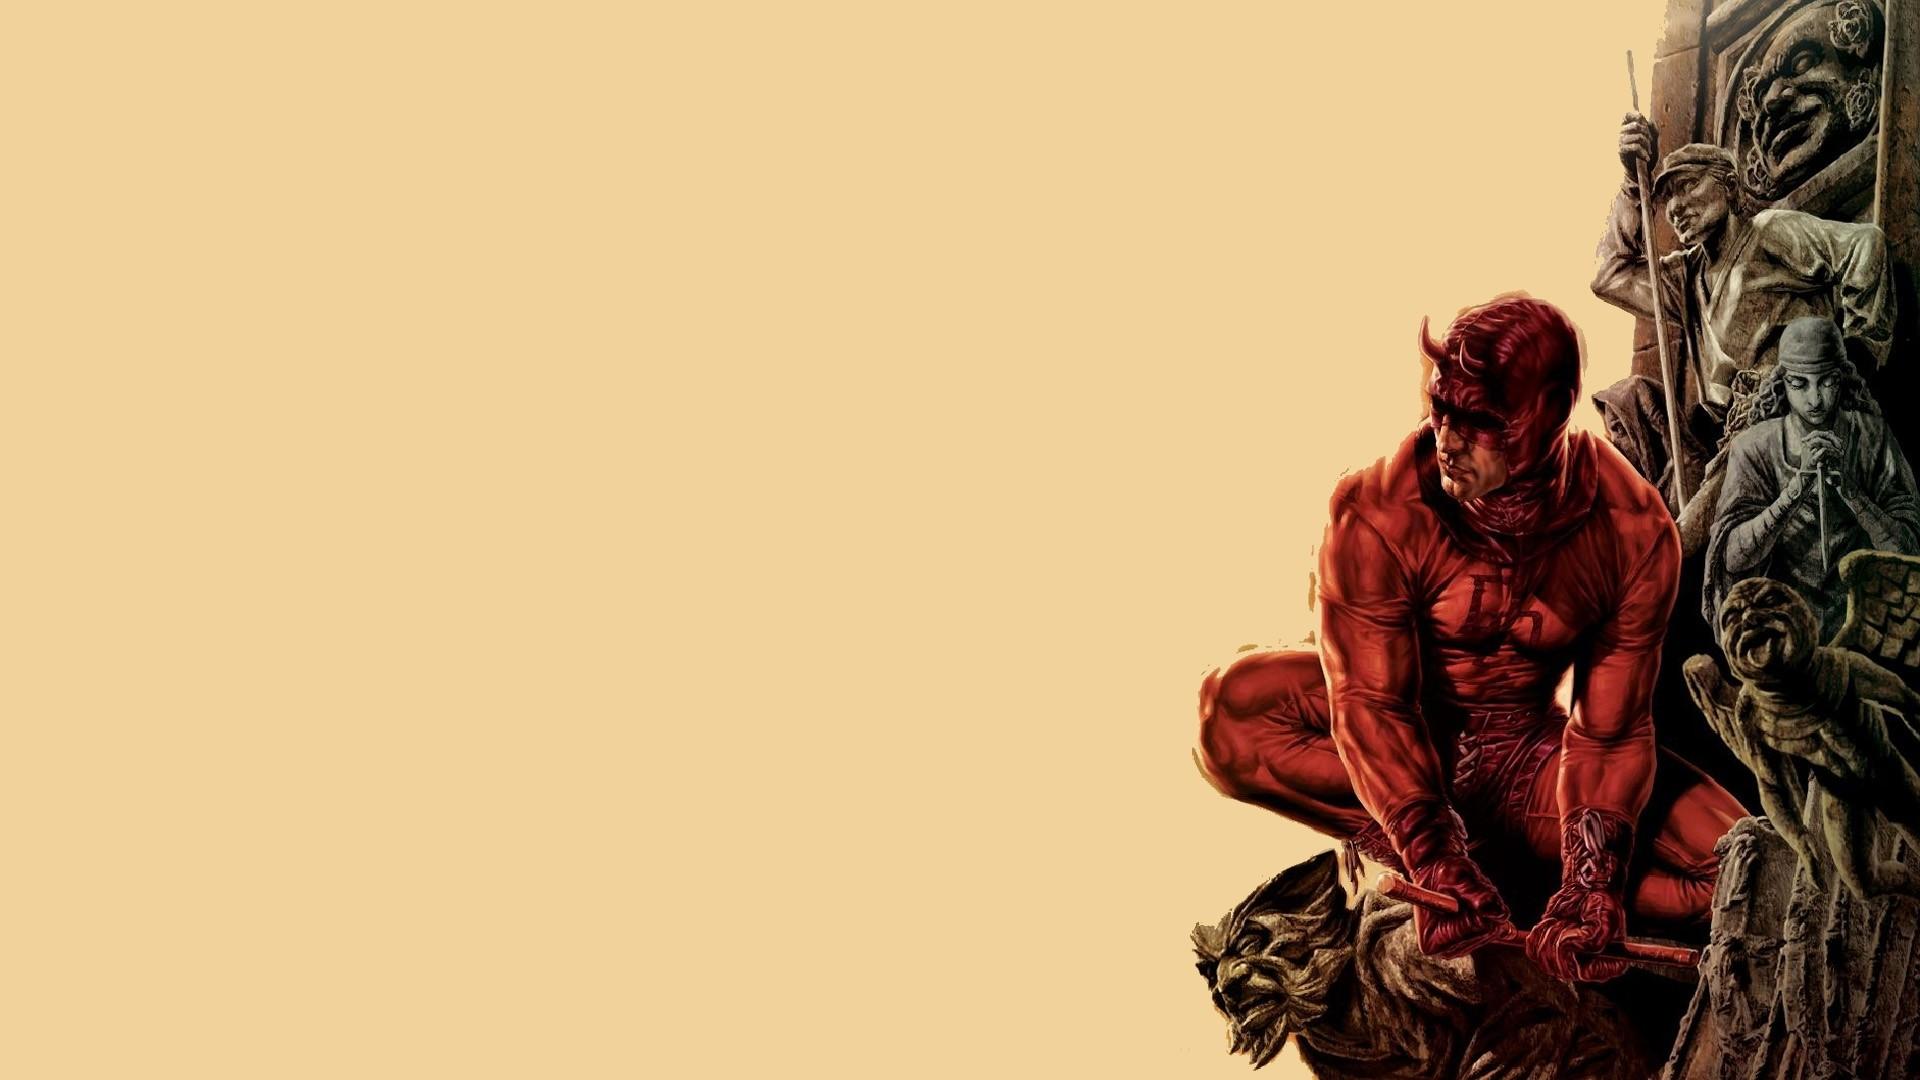 Daredevil Wallpapers HD PixelsTalkNet